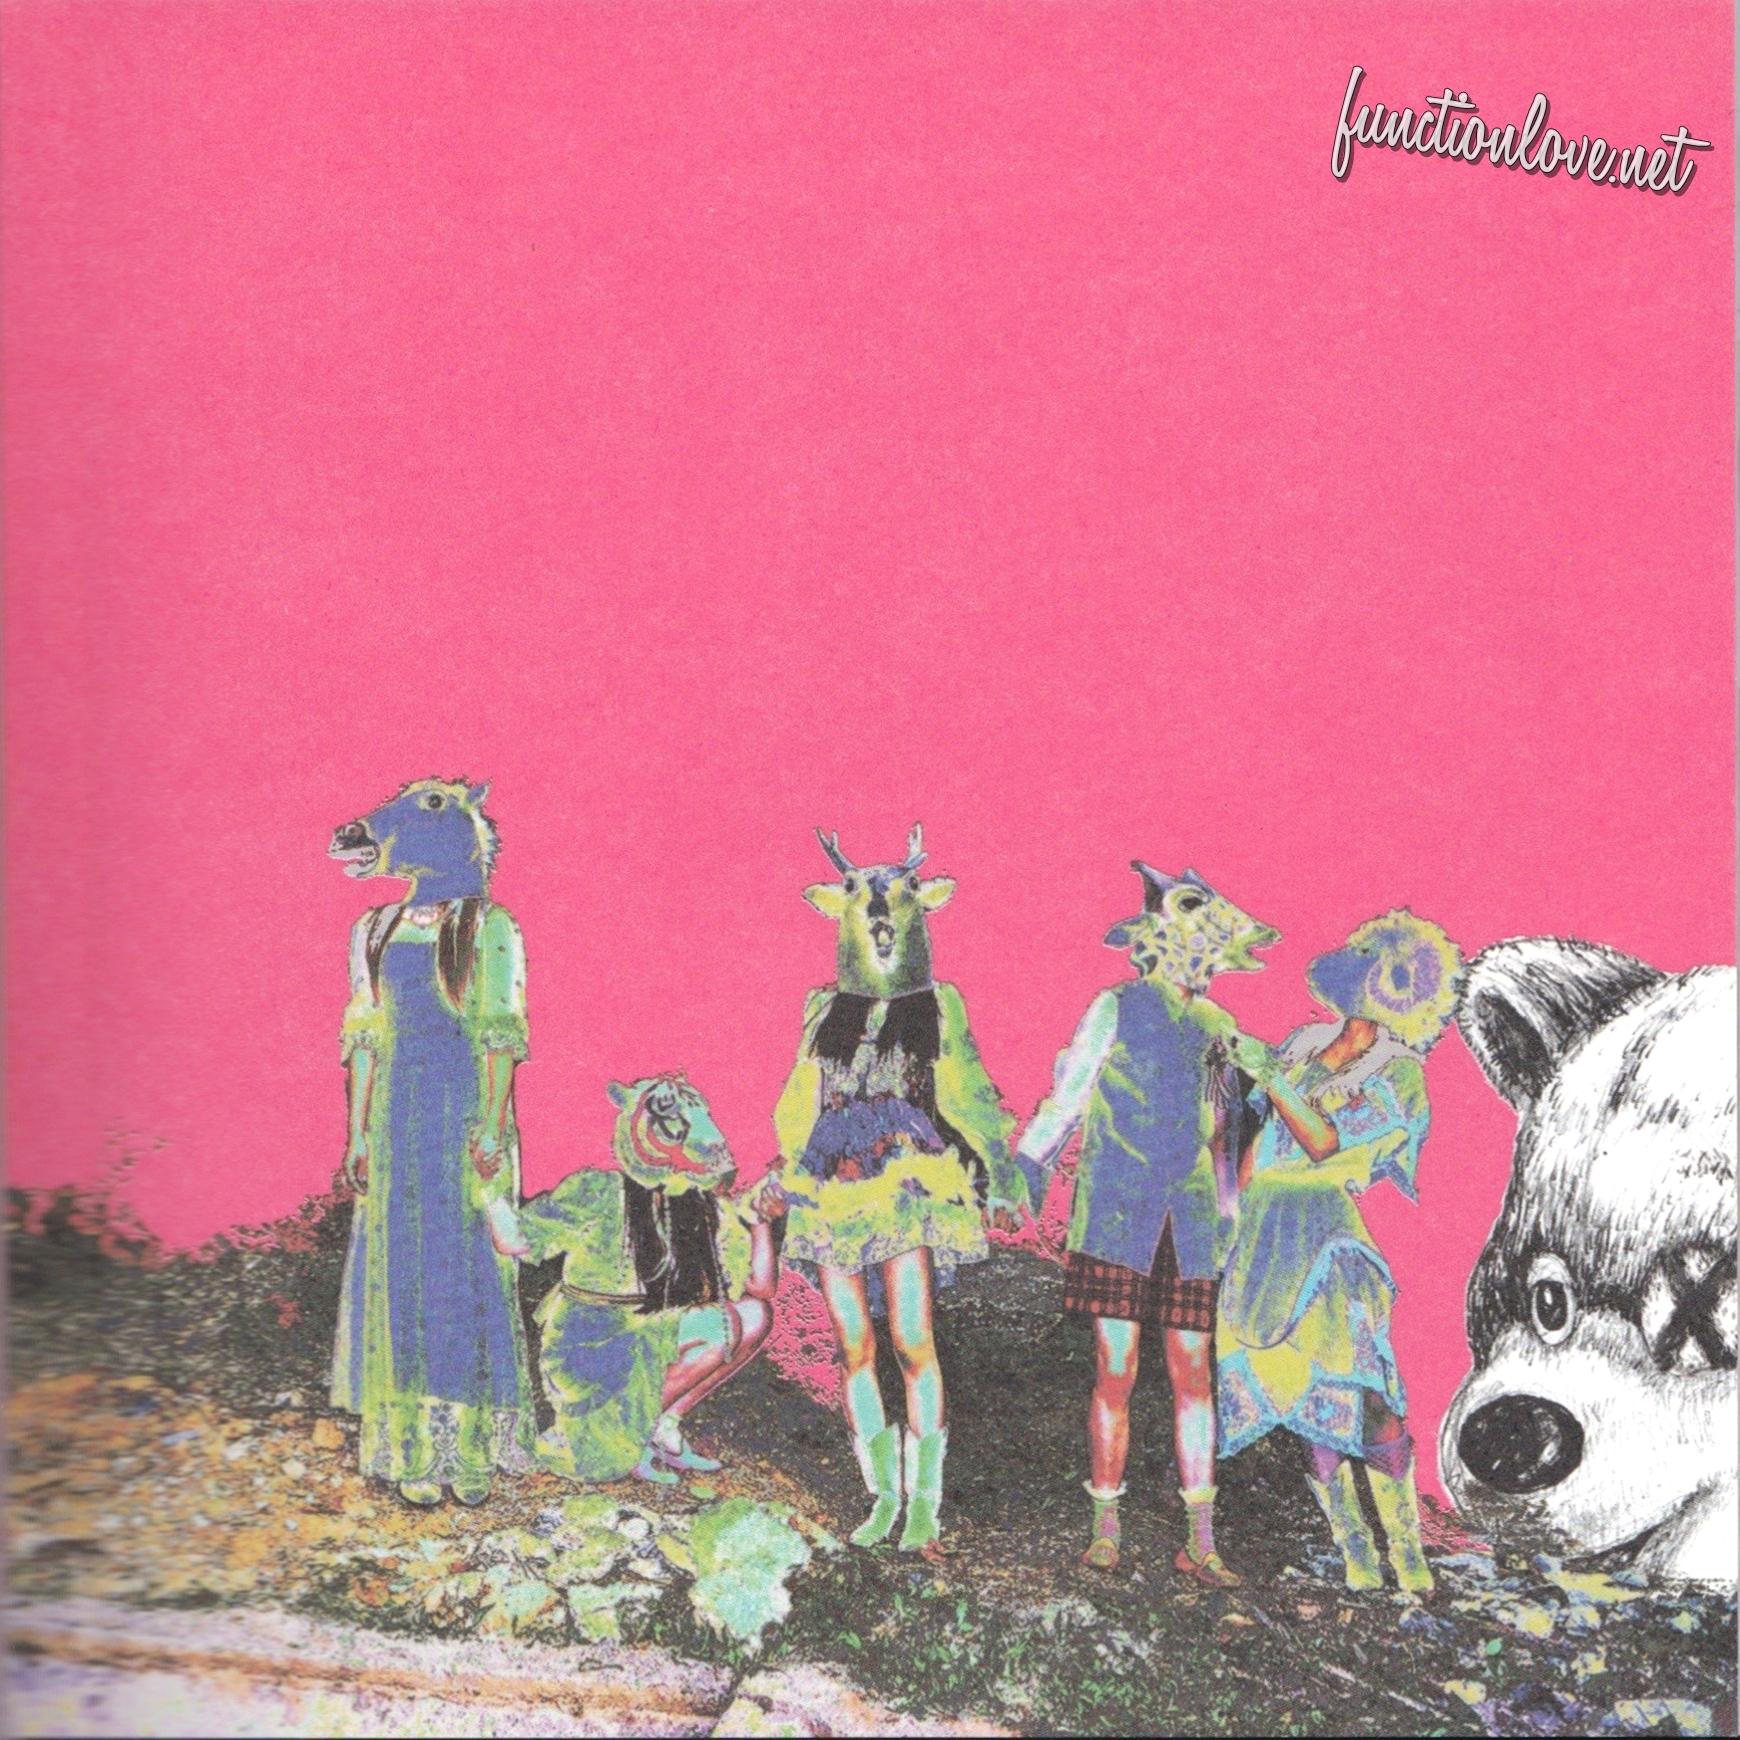 f(♥) Exclusives – [HQ SCANS+DL] f(x) 2nd Mini Album ... F(x) Electric Shock Album Cover